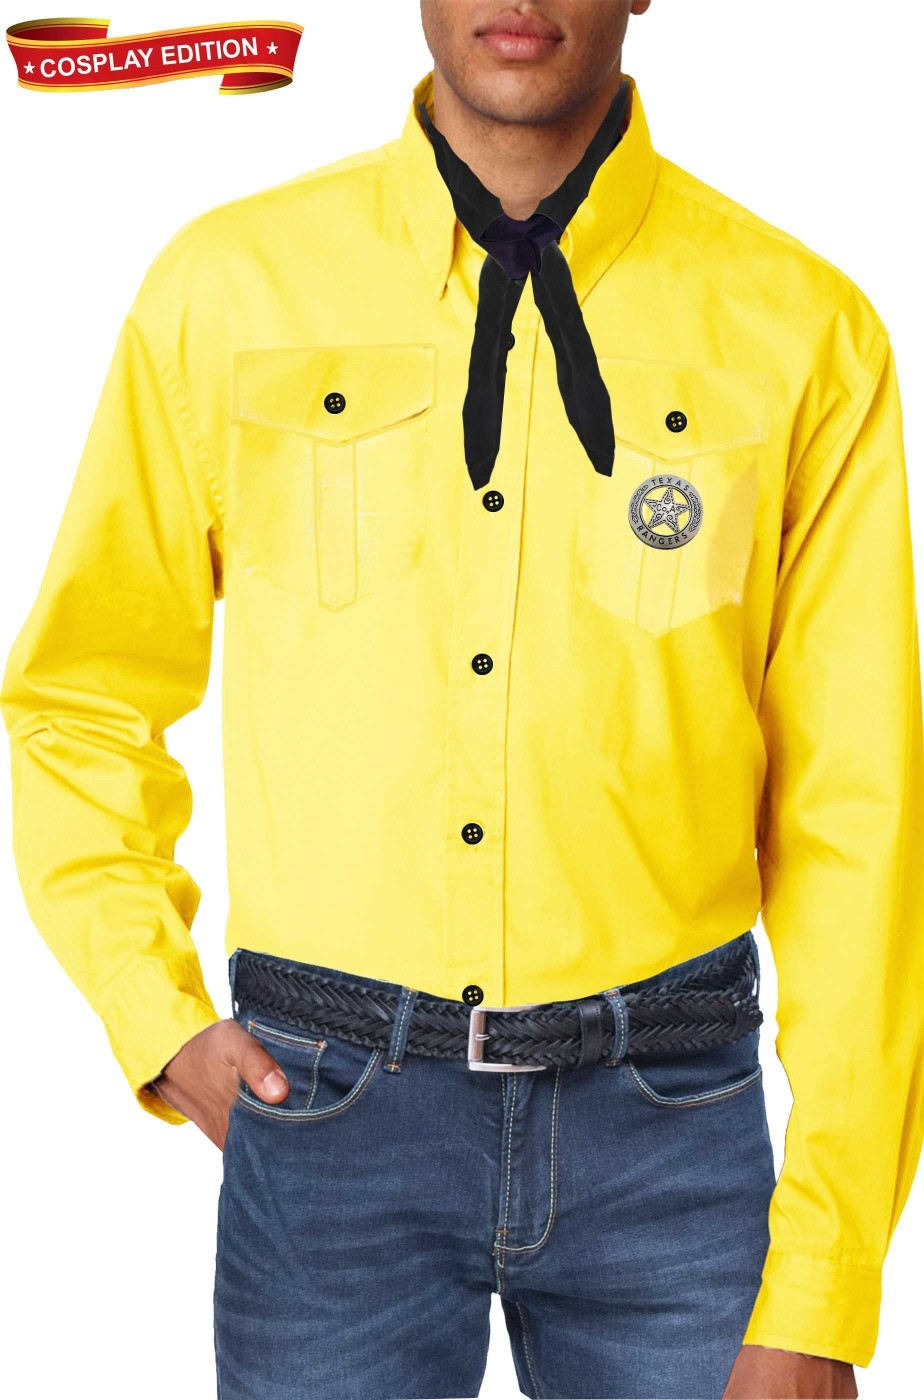 Camicia gialla replica di sartoria Costume cosplay Tex Willer con spilla Texas Rangers